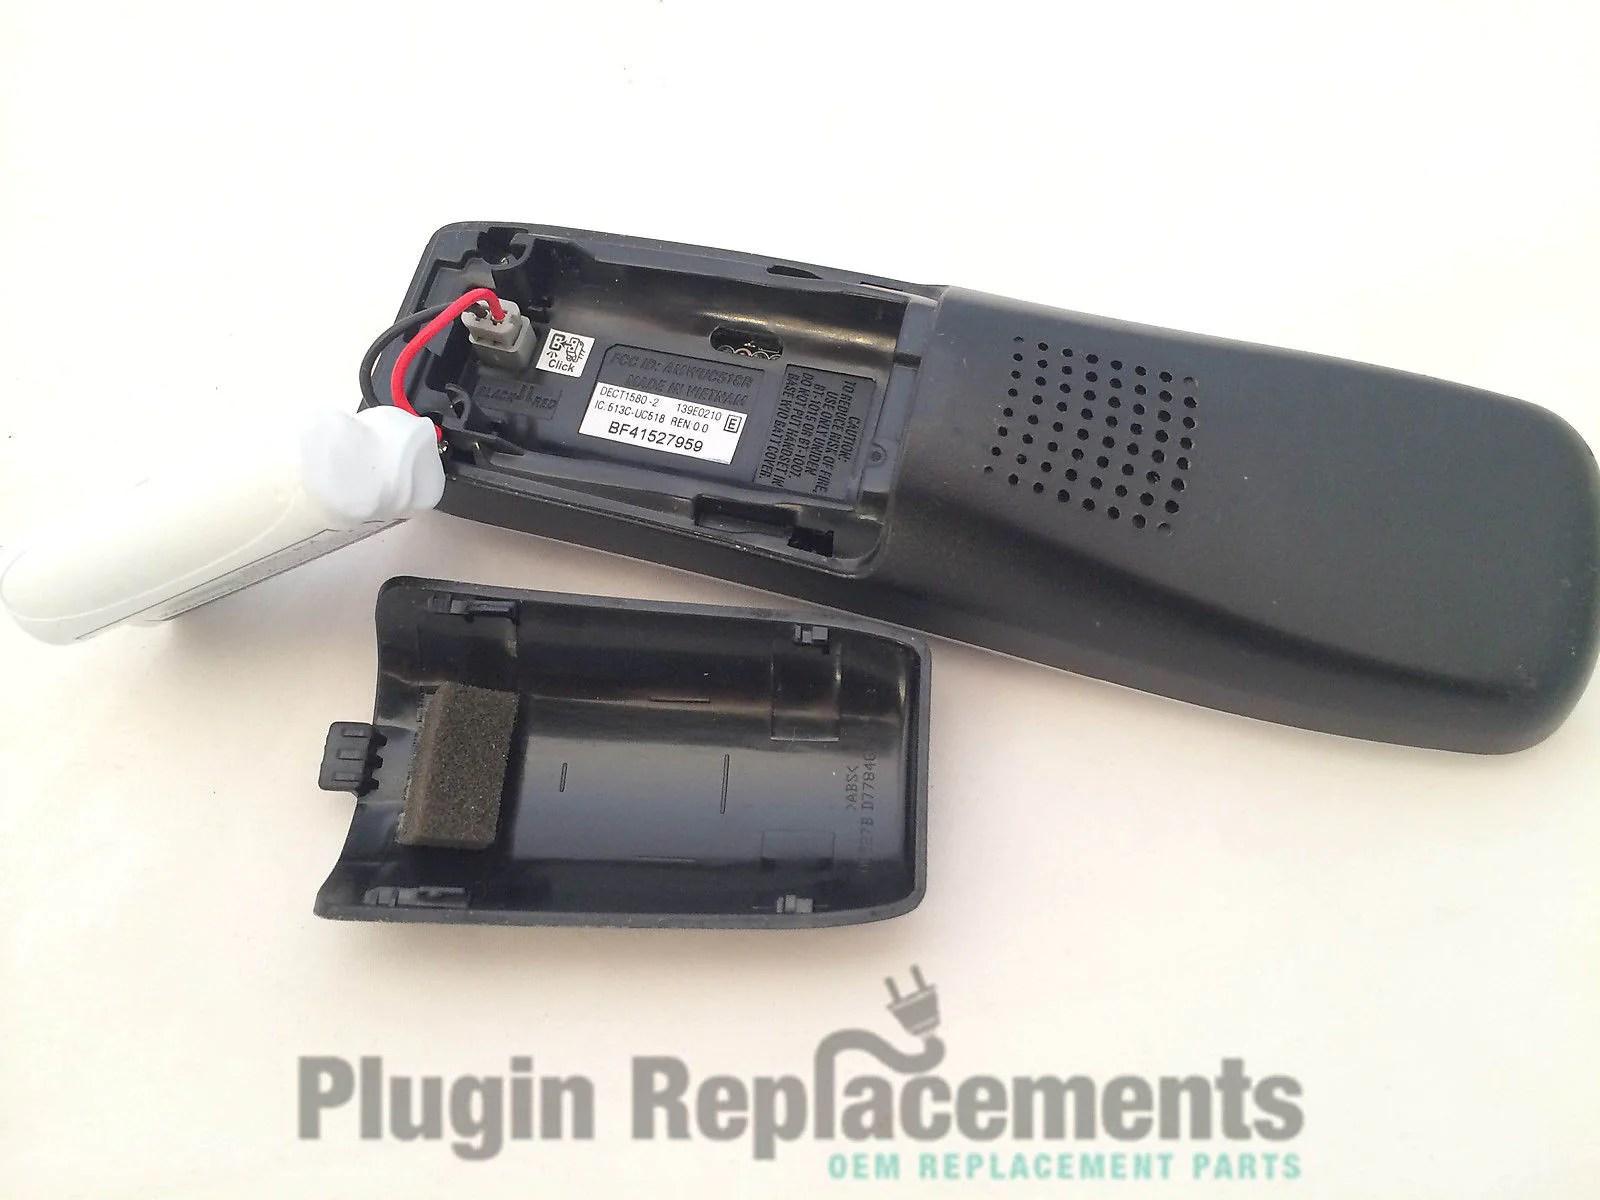 Uniden Dect1580 5 Manual Auto Electrical Wiring Diagram Nissan Qg18dd